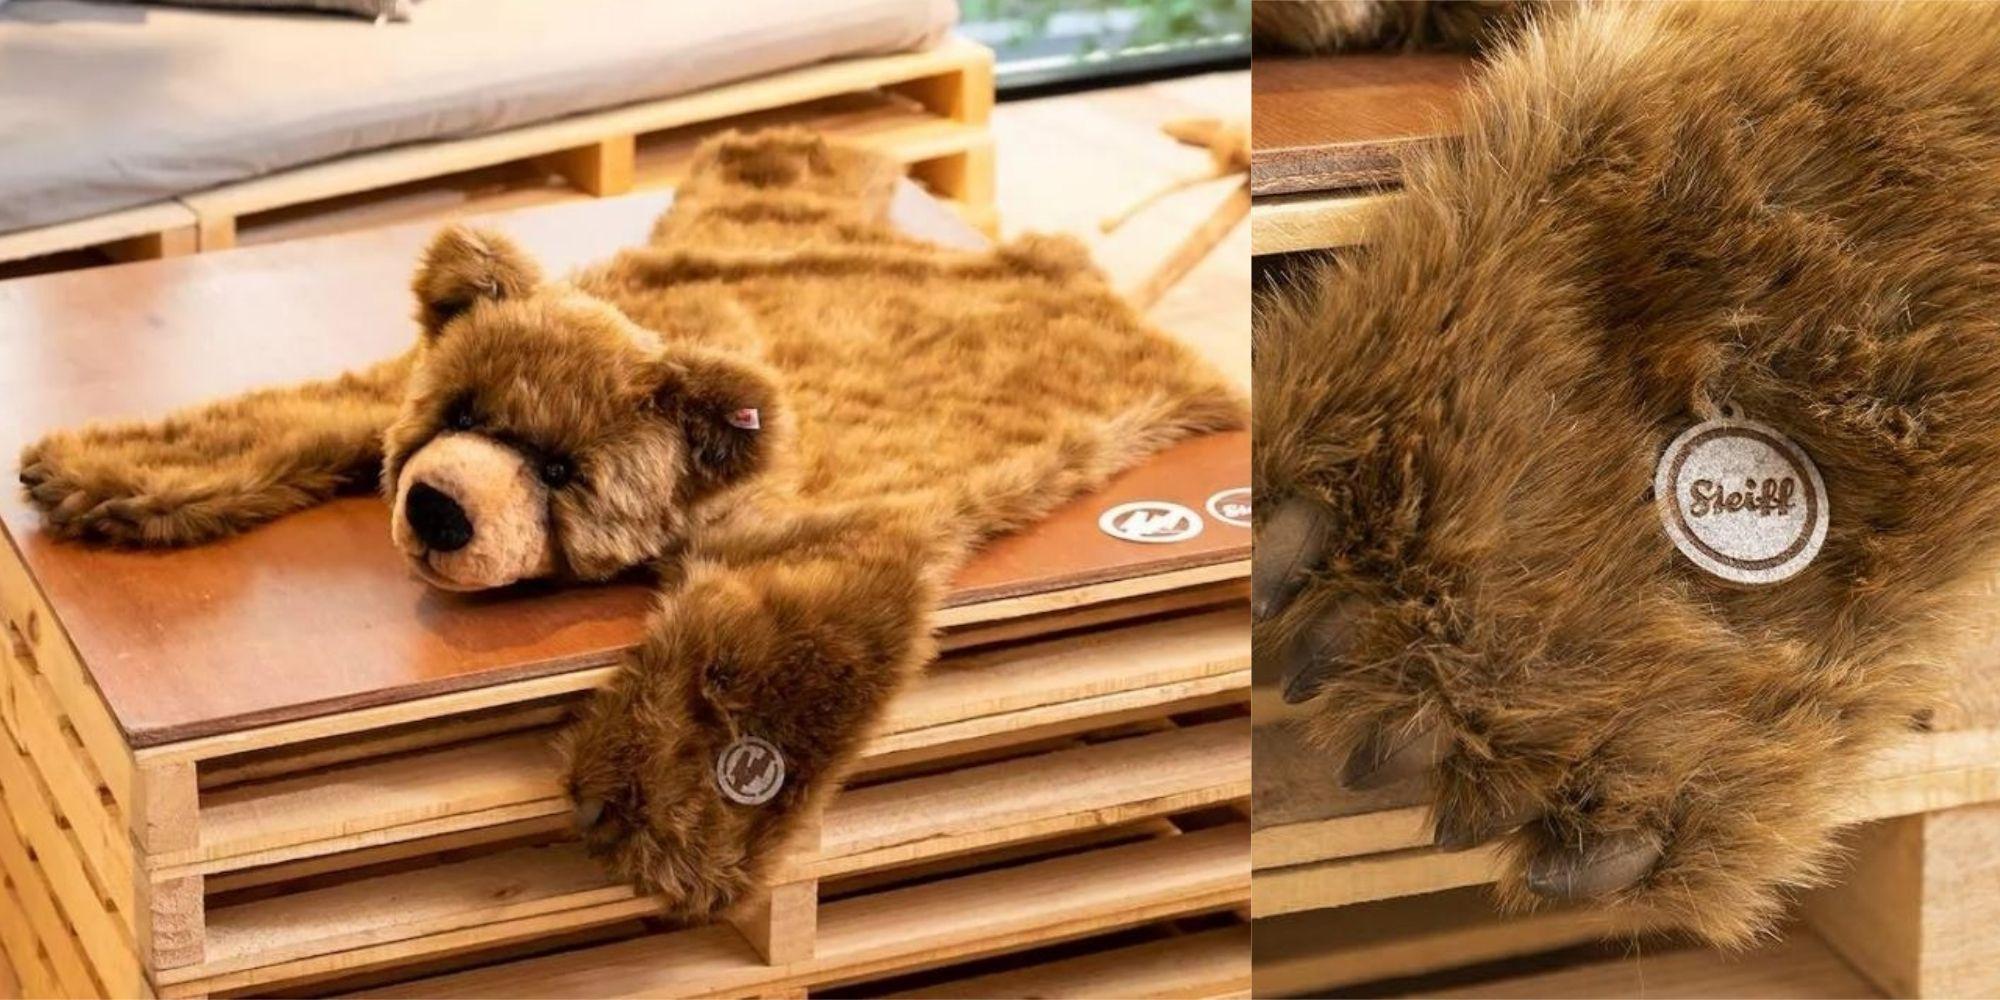 【ELLE 怪奇物語】潮流教父藤原浩把 Steiff 泰迪熊做成「熊皮地毯」... 這個設計太狠心了!